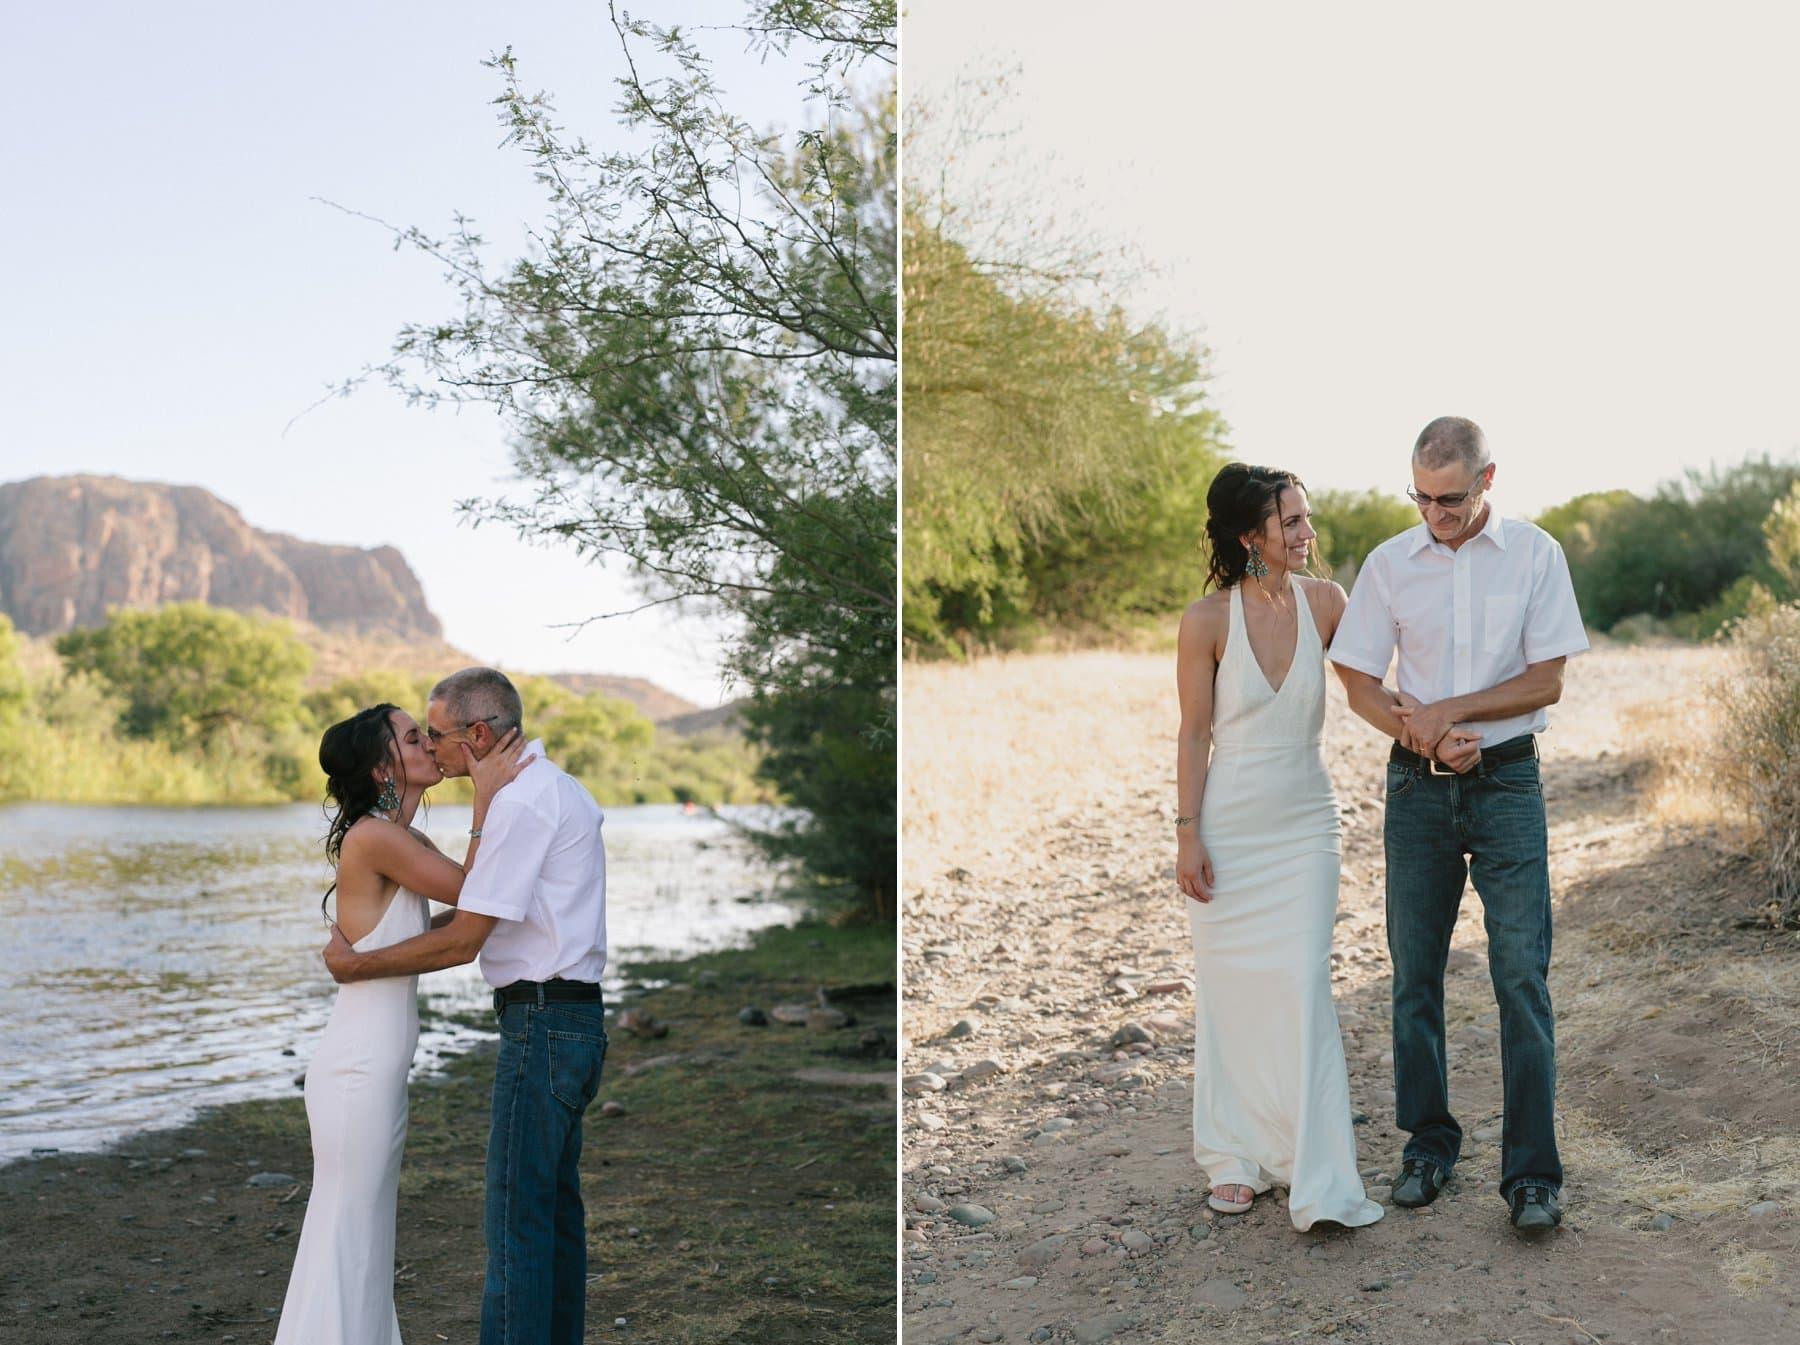 Arizona elopement photographer Salt River